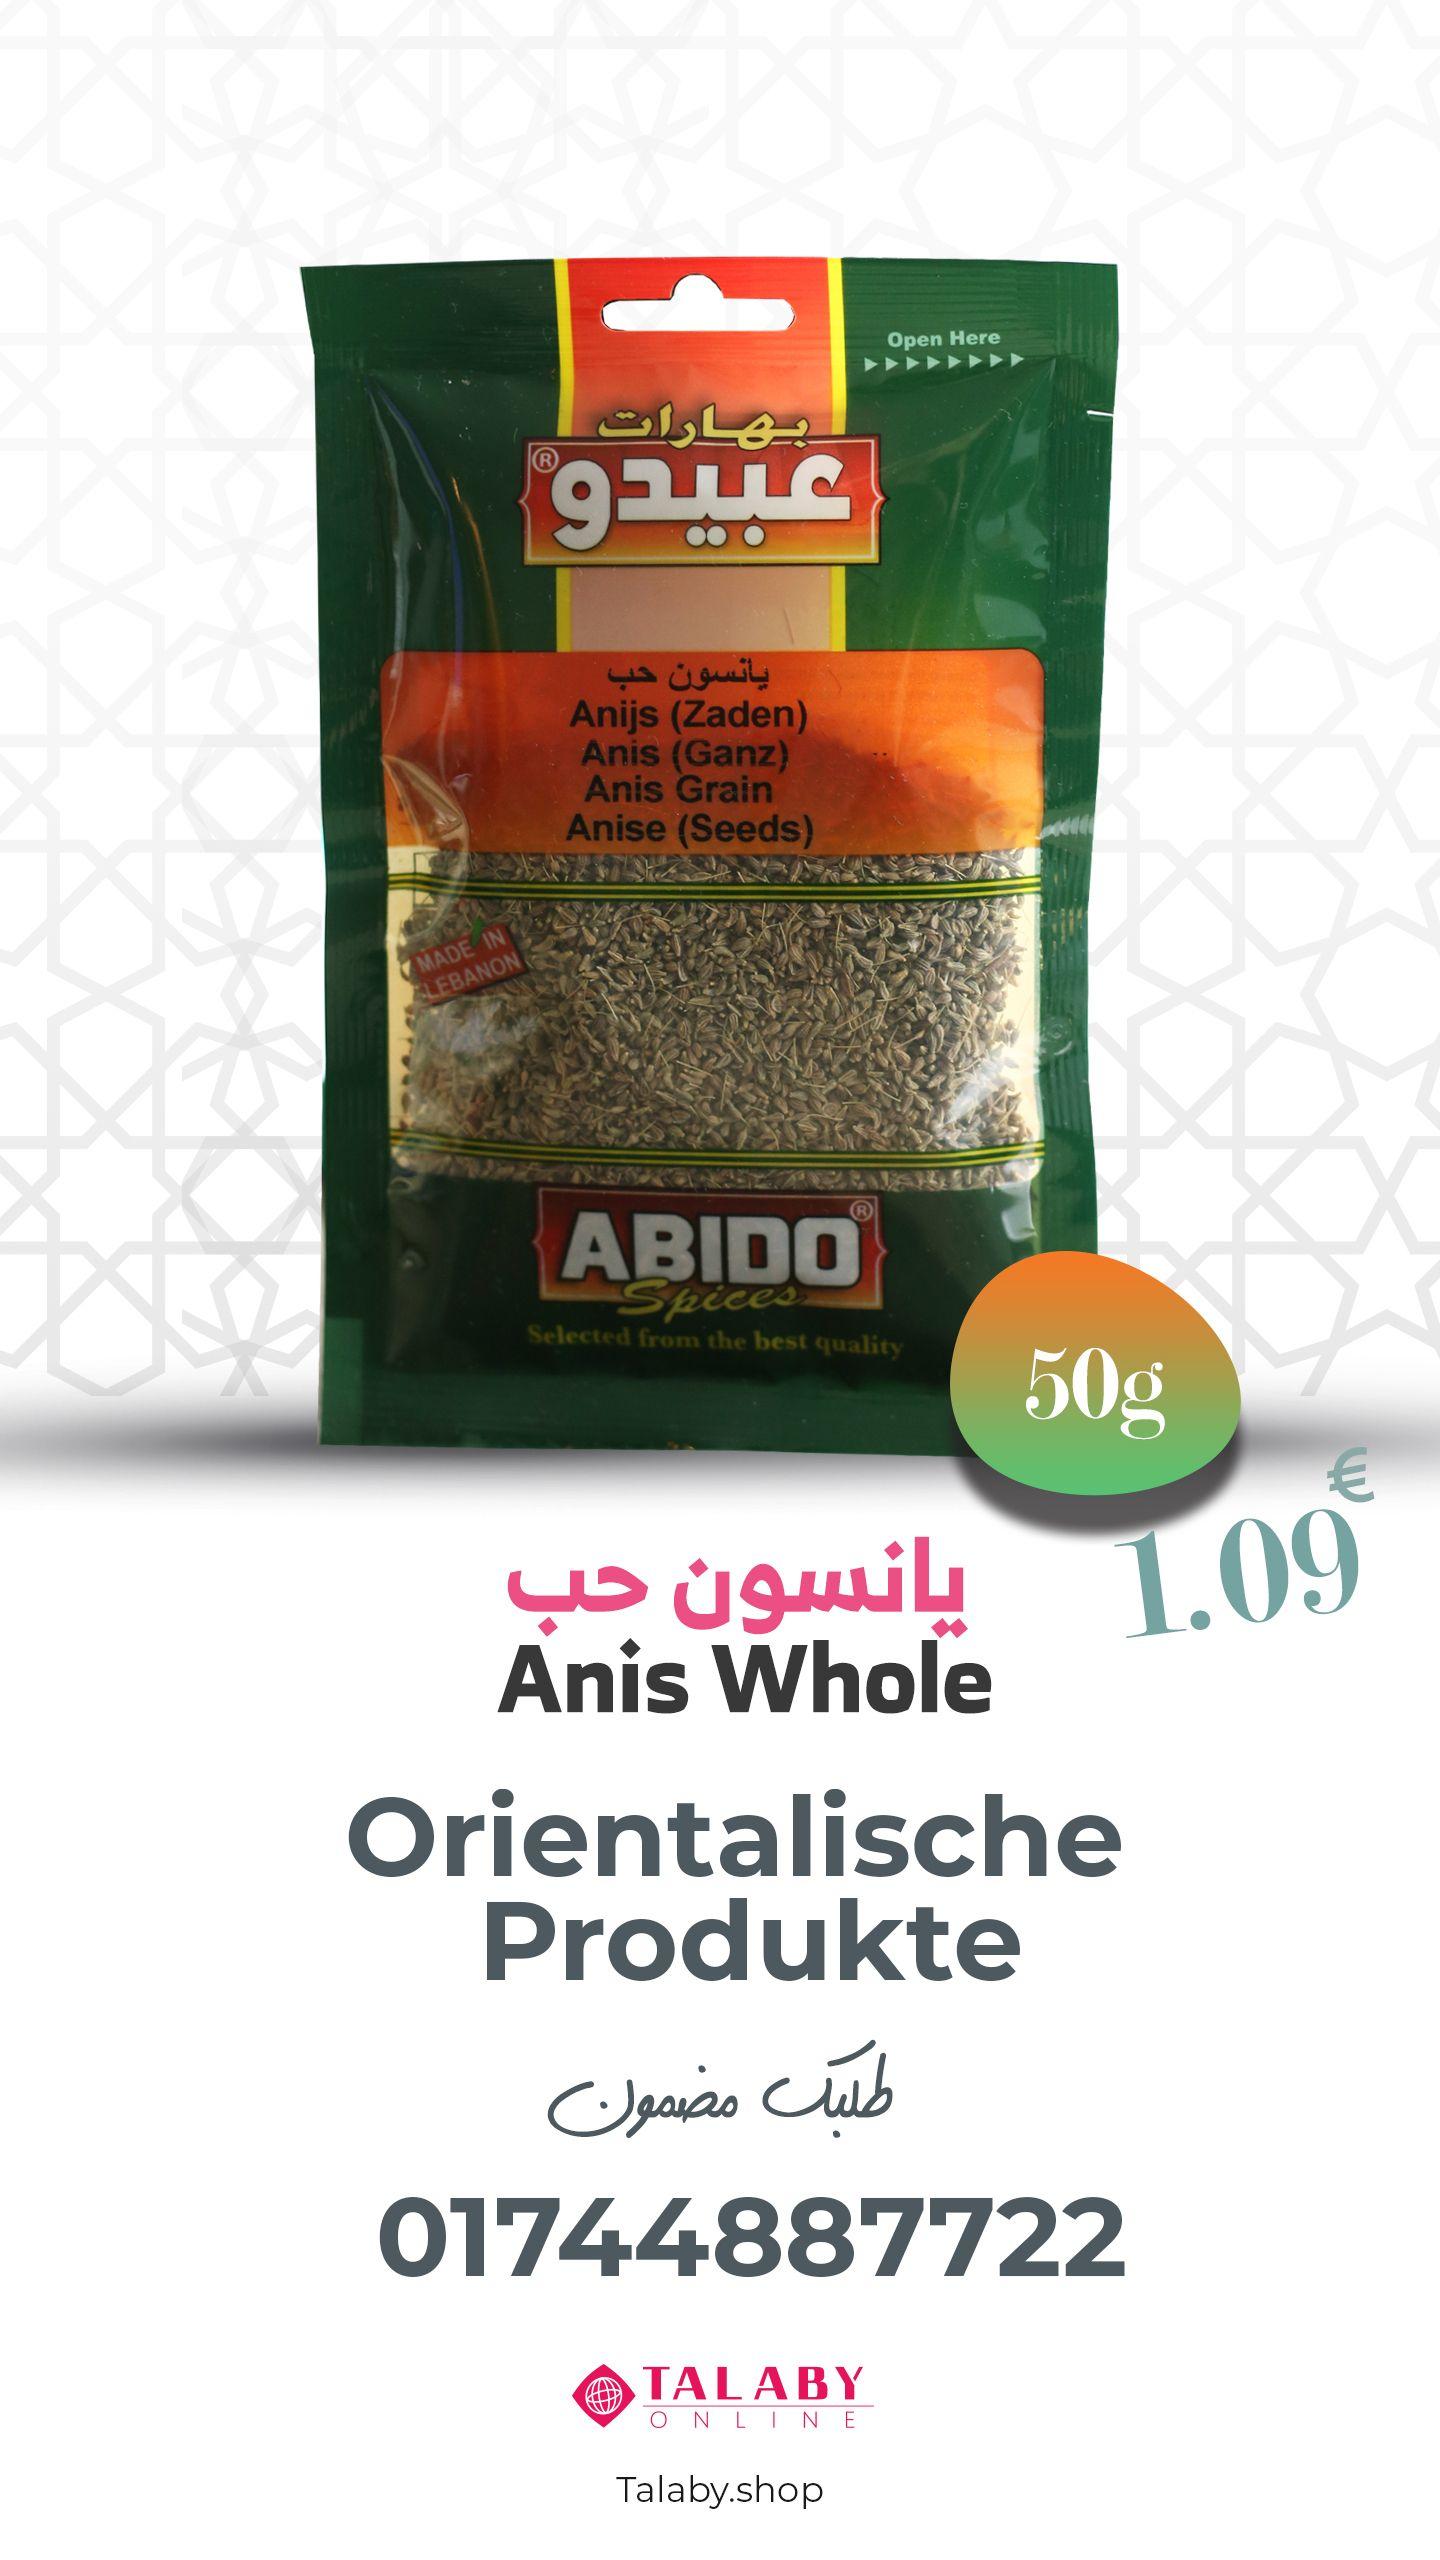 Anis Whole يانسون حب